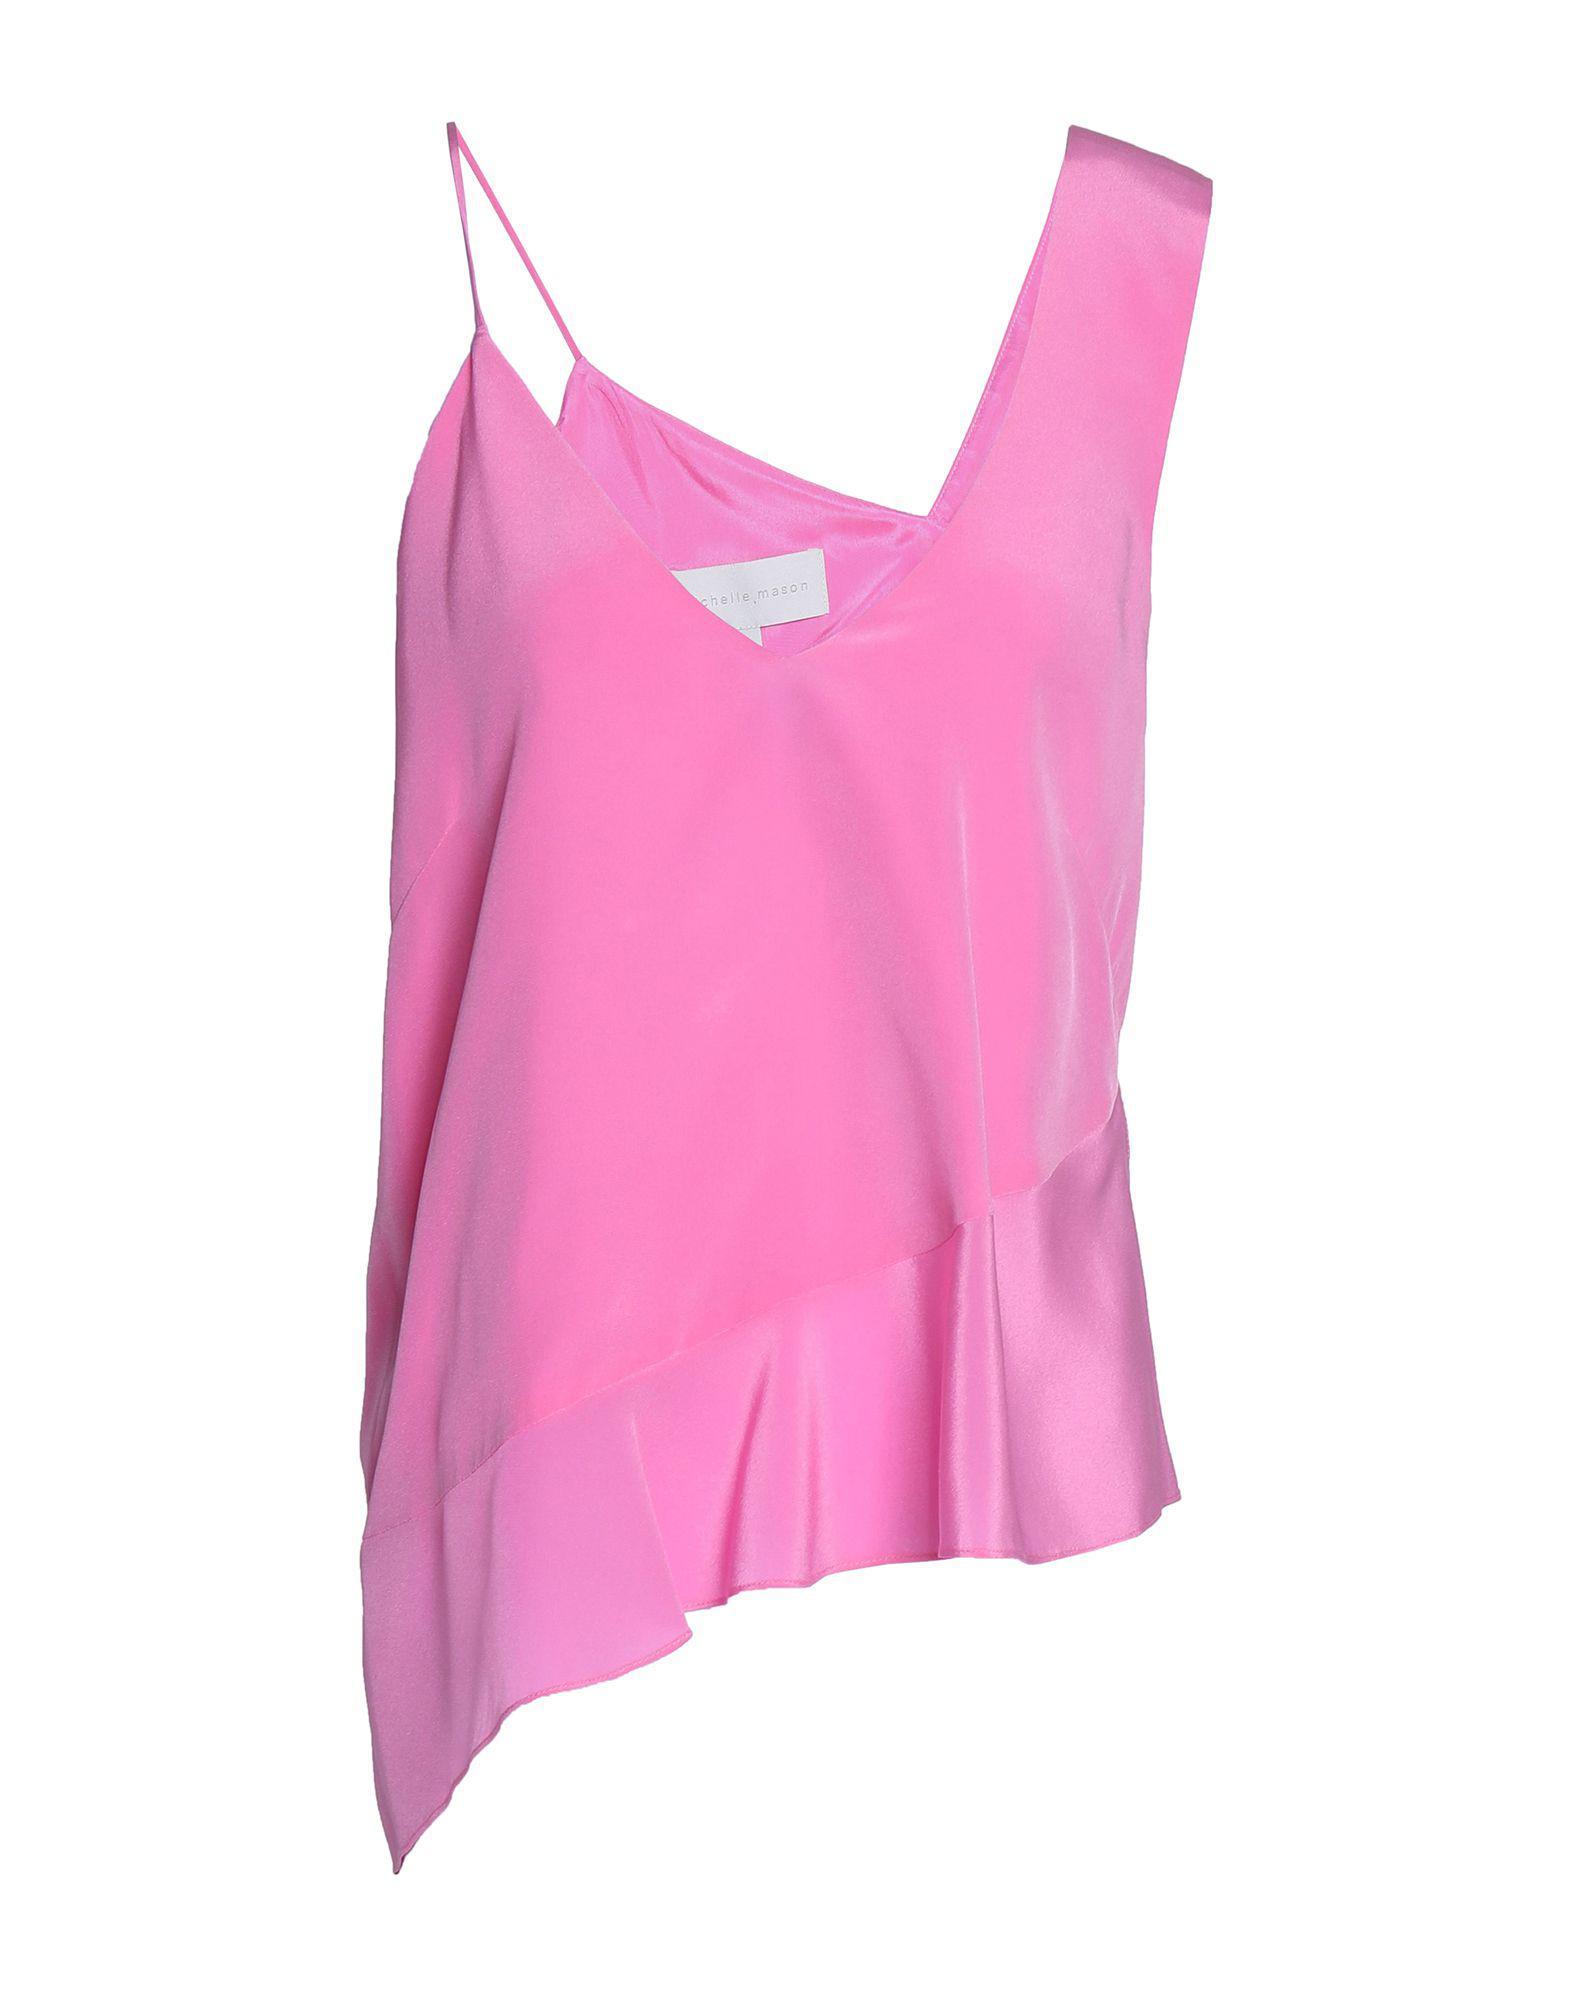 57b185f7f9cb45 Lyst - Michelle Mason Top in Pink - Save 20%